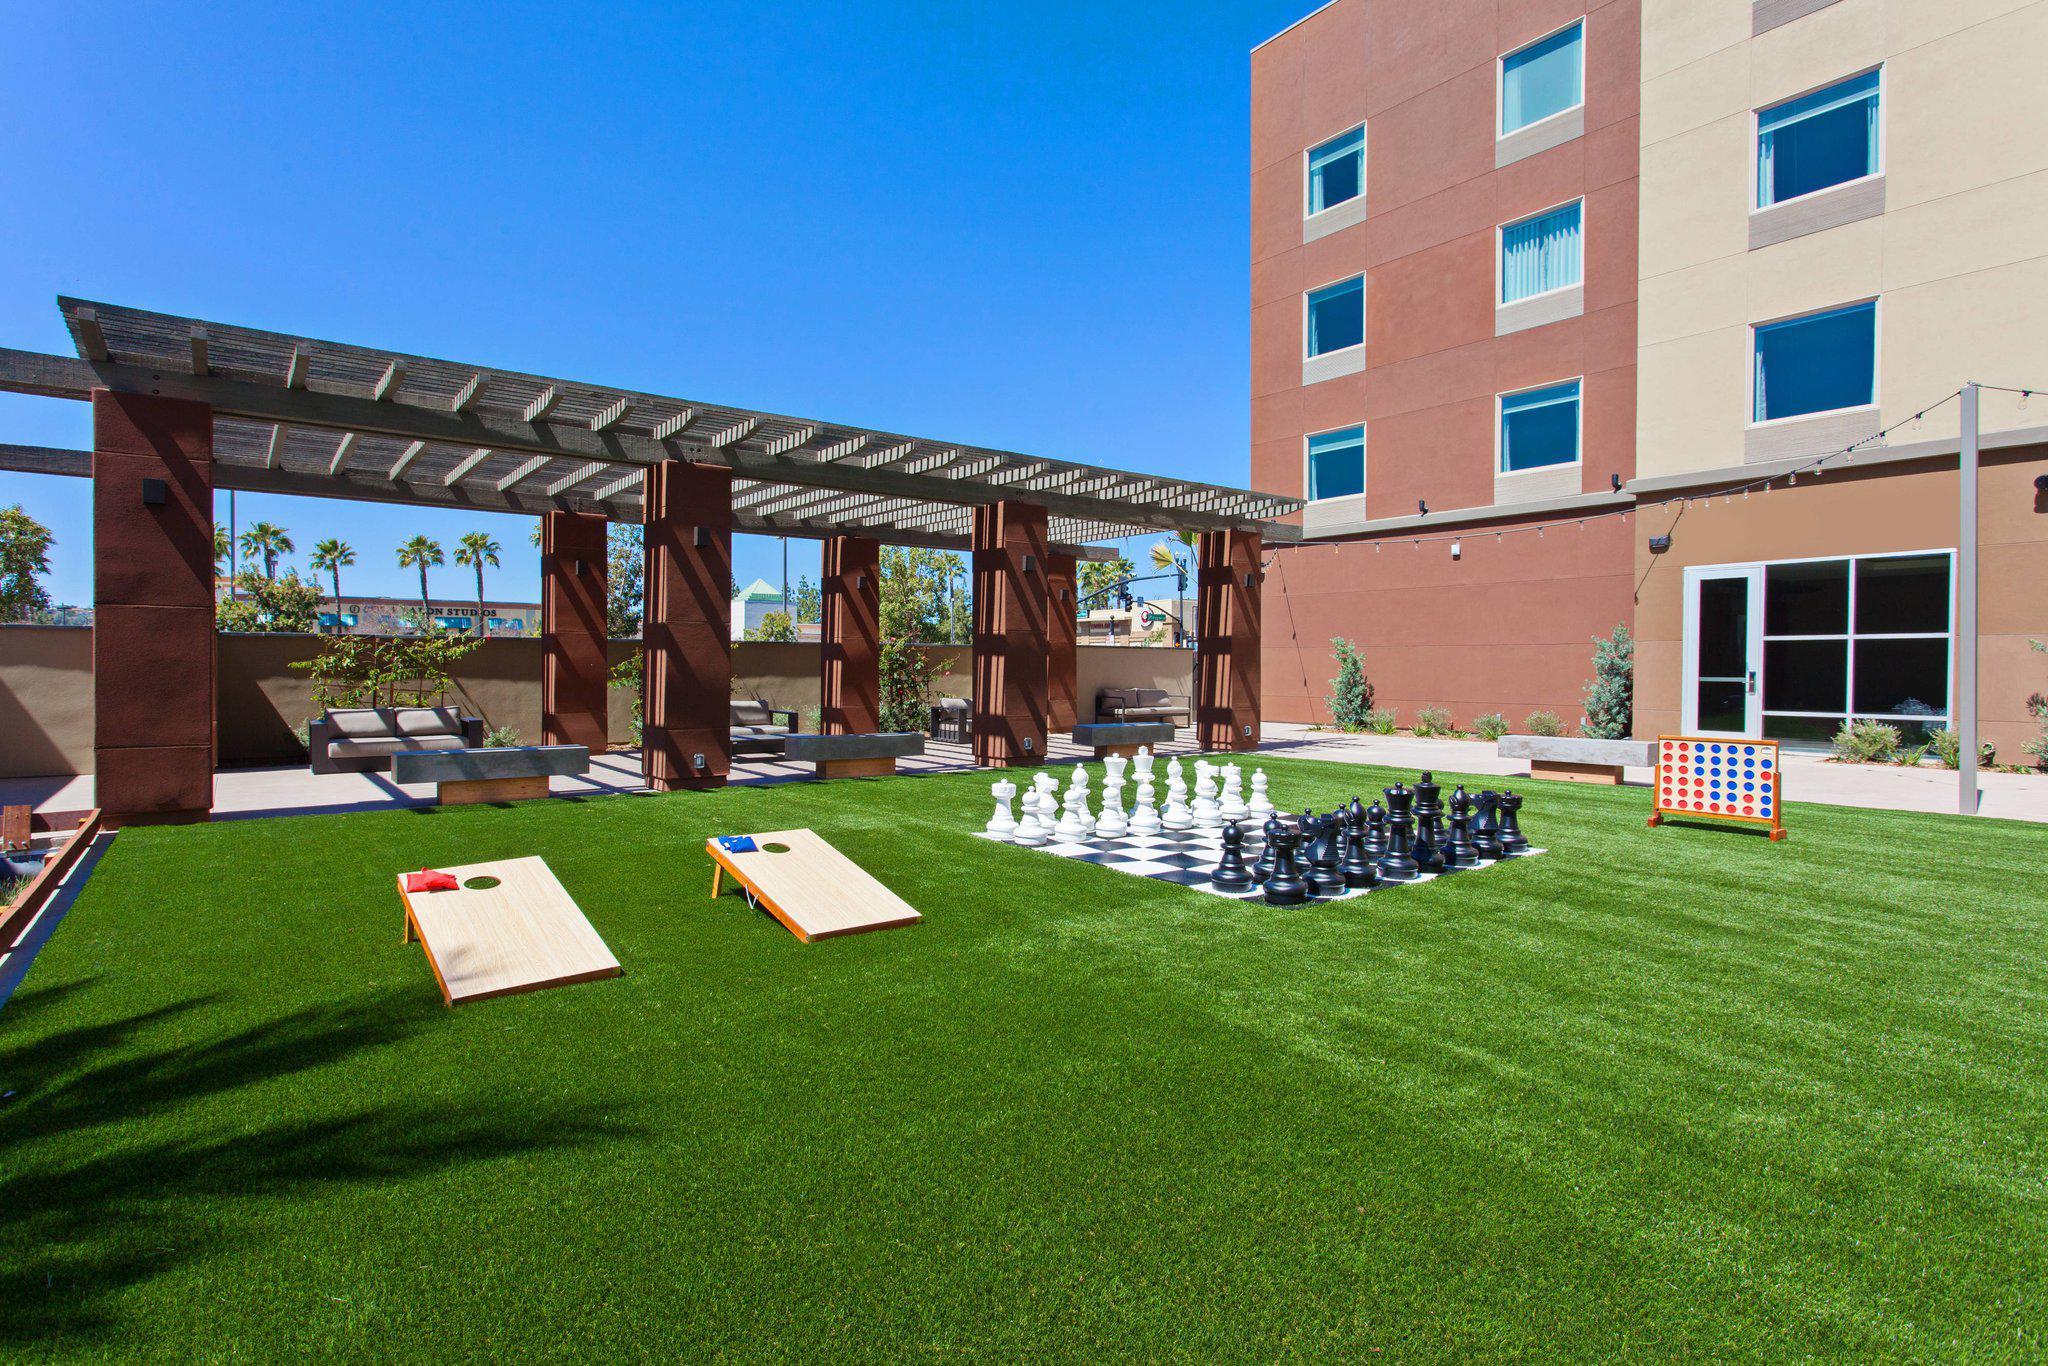 Courtyard by Marriott San Diego El Cajon